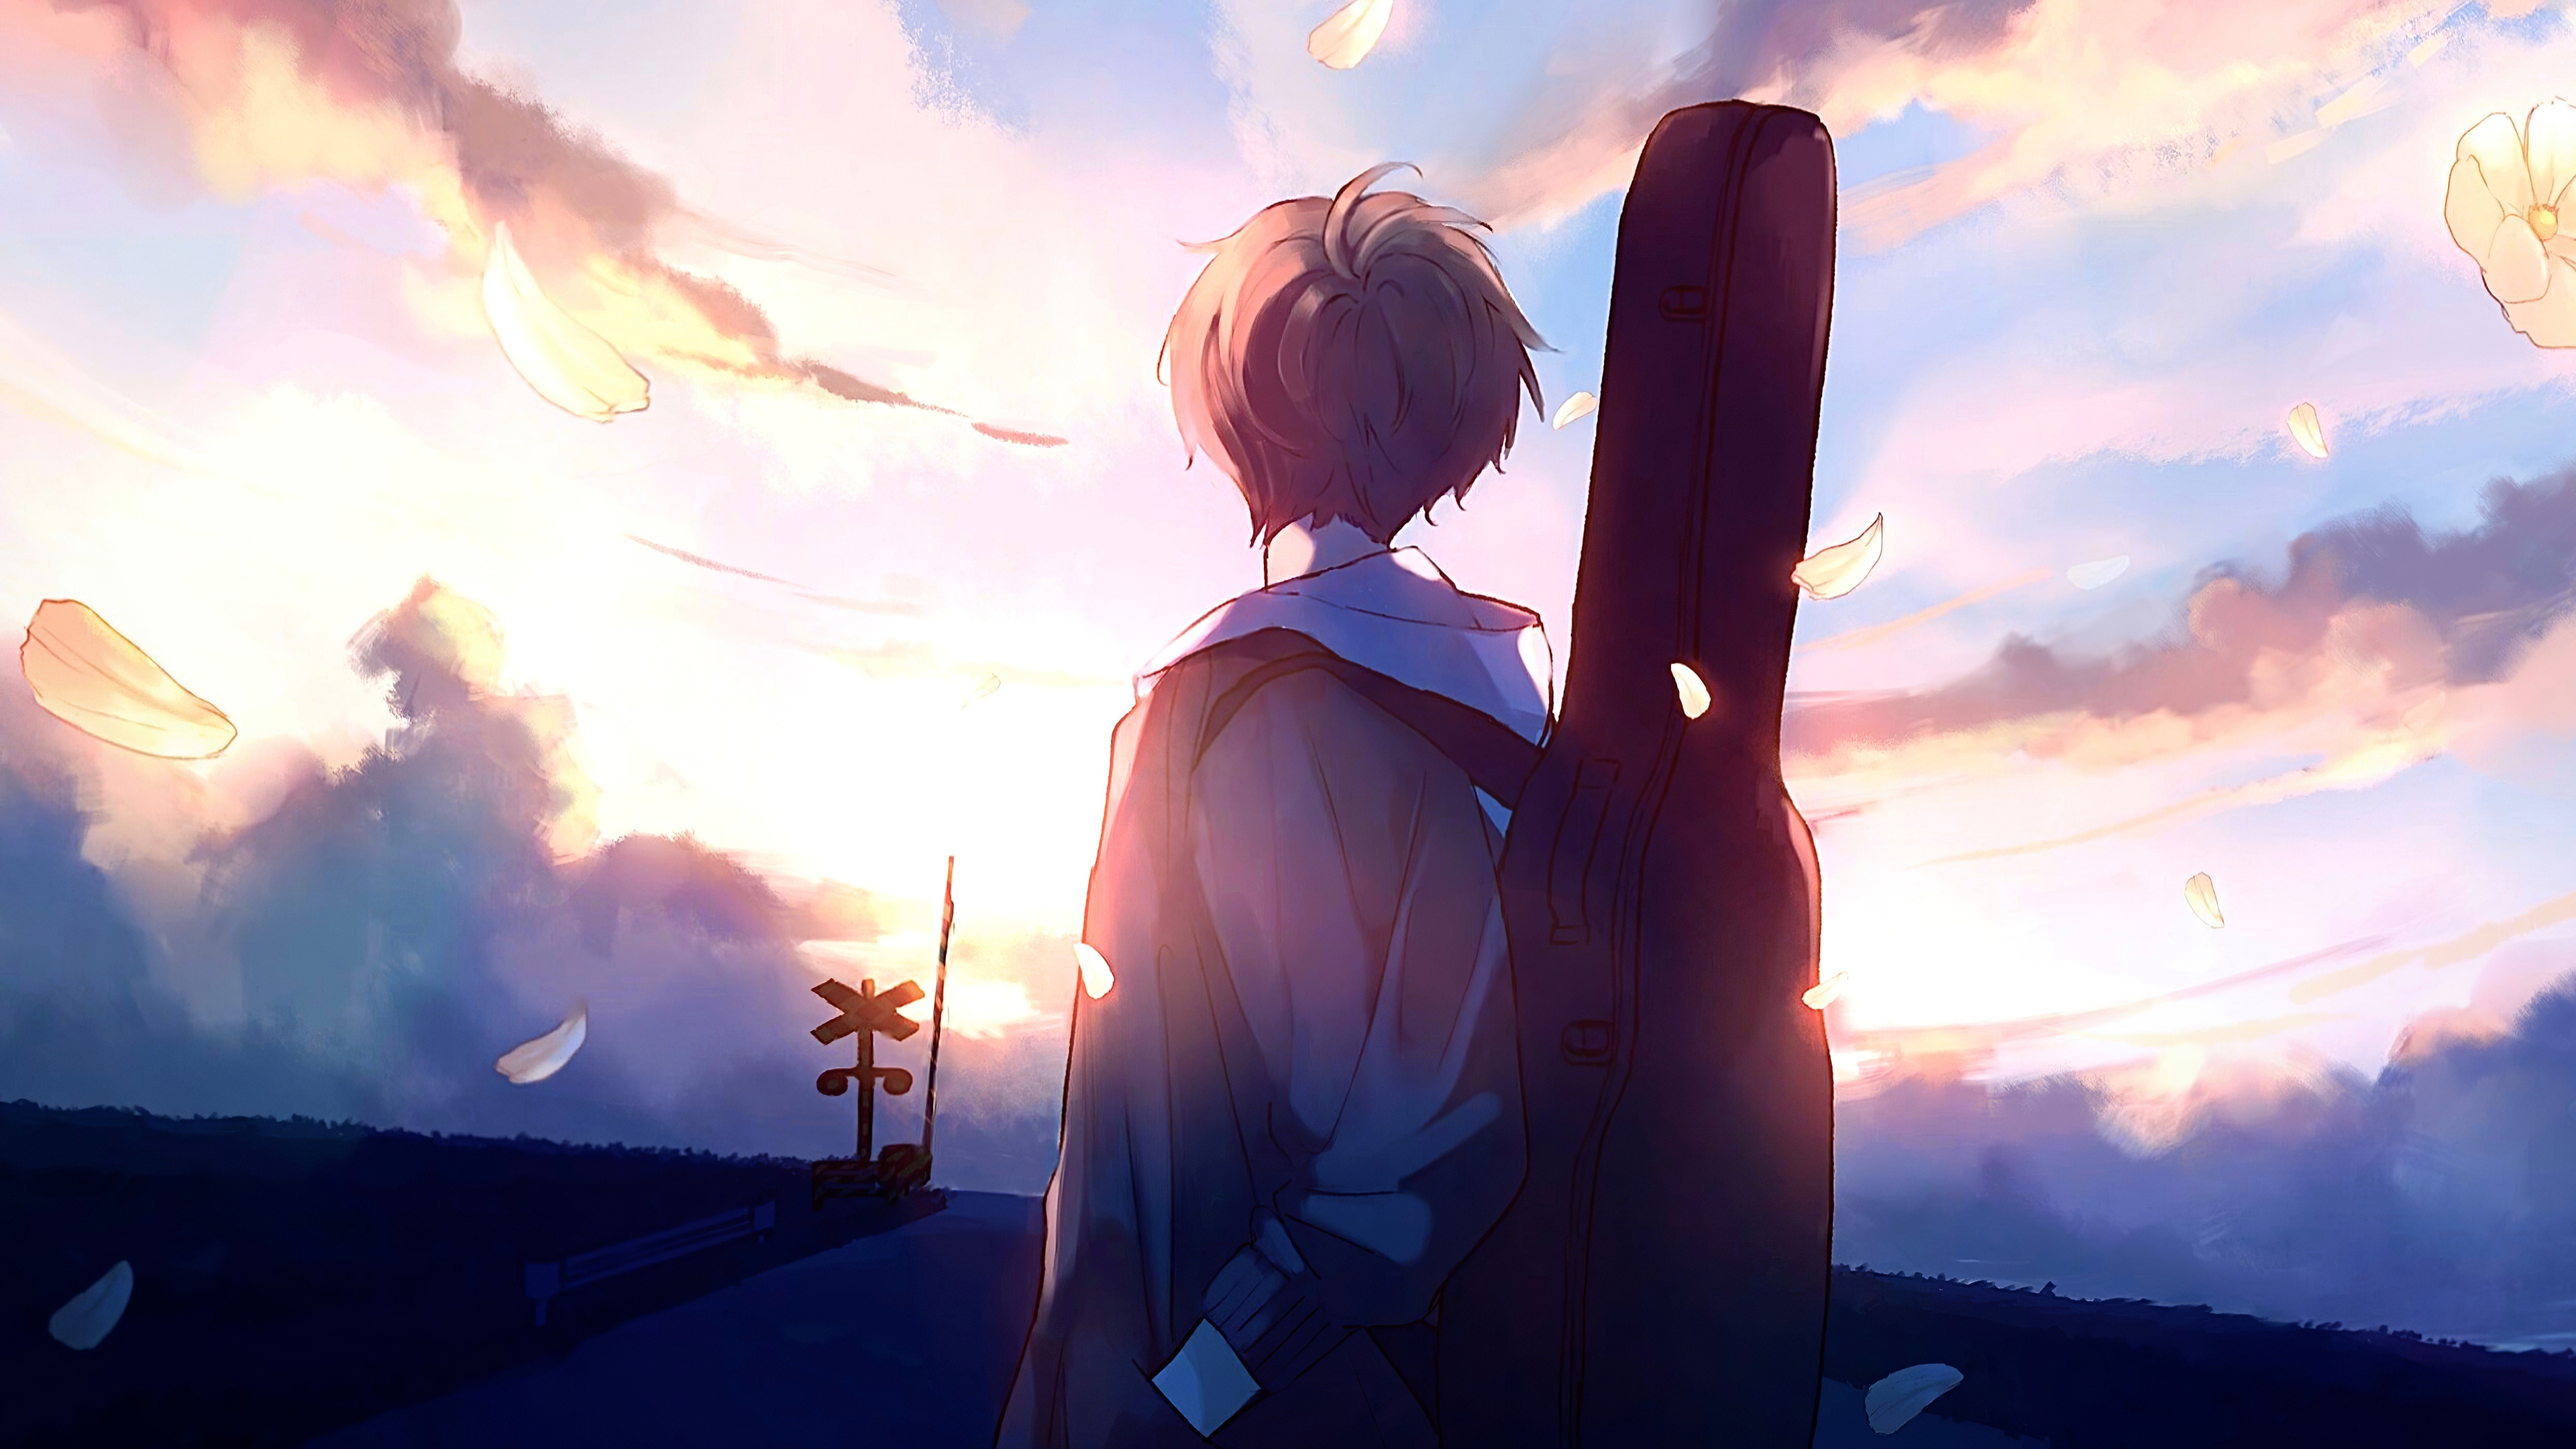 3840x2160 Anime Boy Guitar Painting 4k HD 4k Wallpapers ...